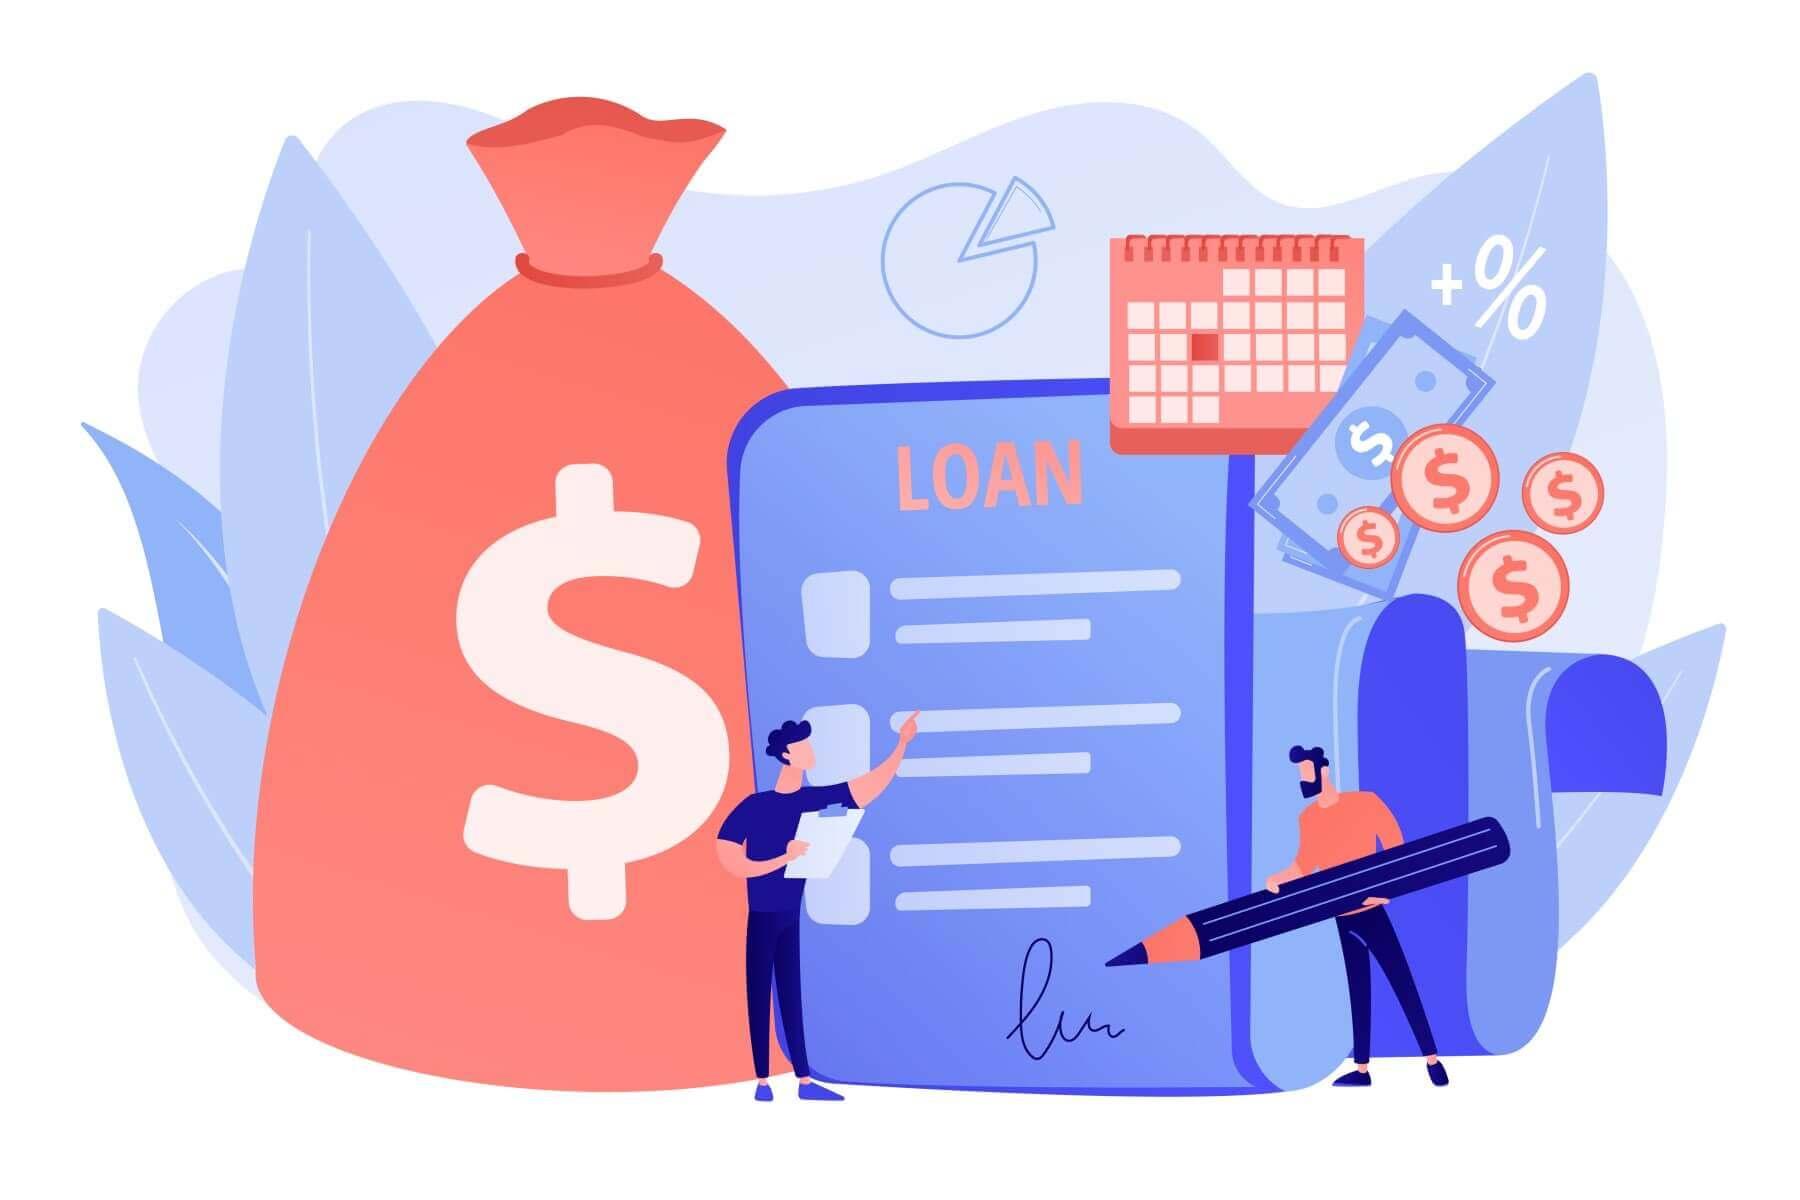 loan-origin-software-2021